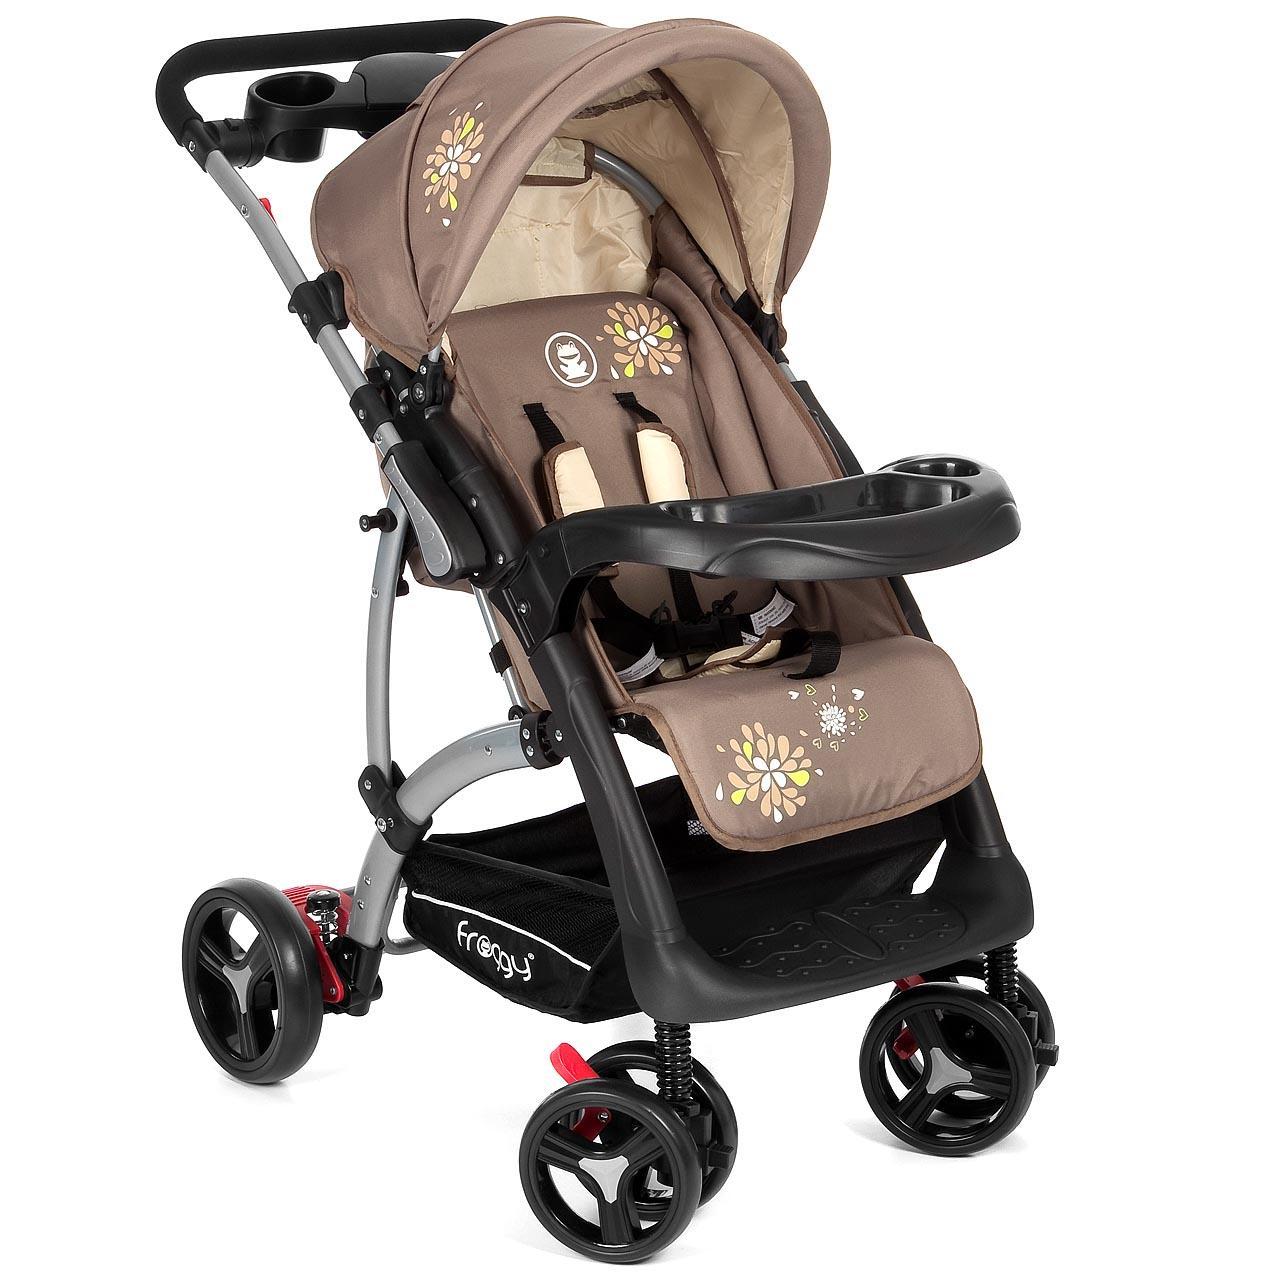 kinderwagen ranger s4 buggy jogger sportwagen babywagen. Black Bedroom Furniture Sets. Home Design Ideas